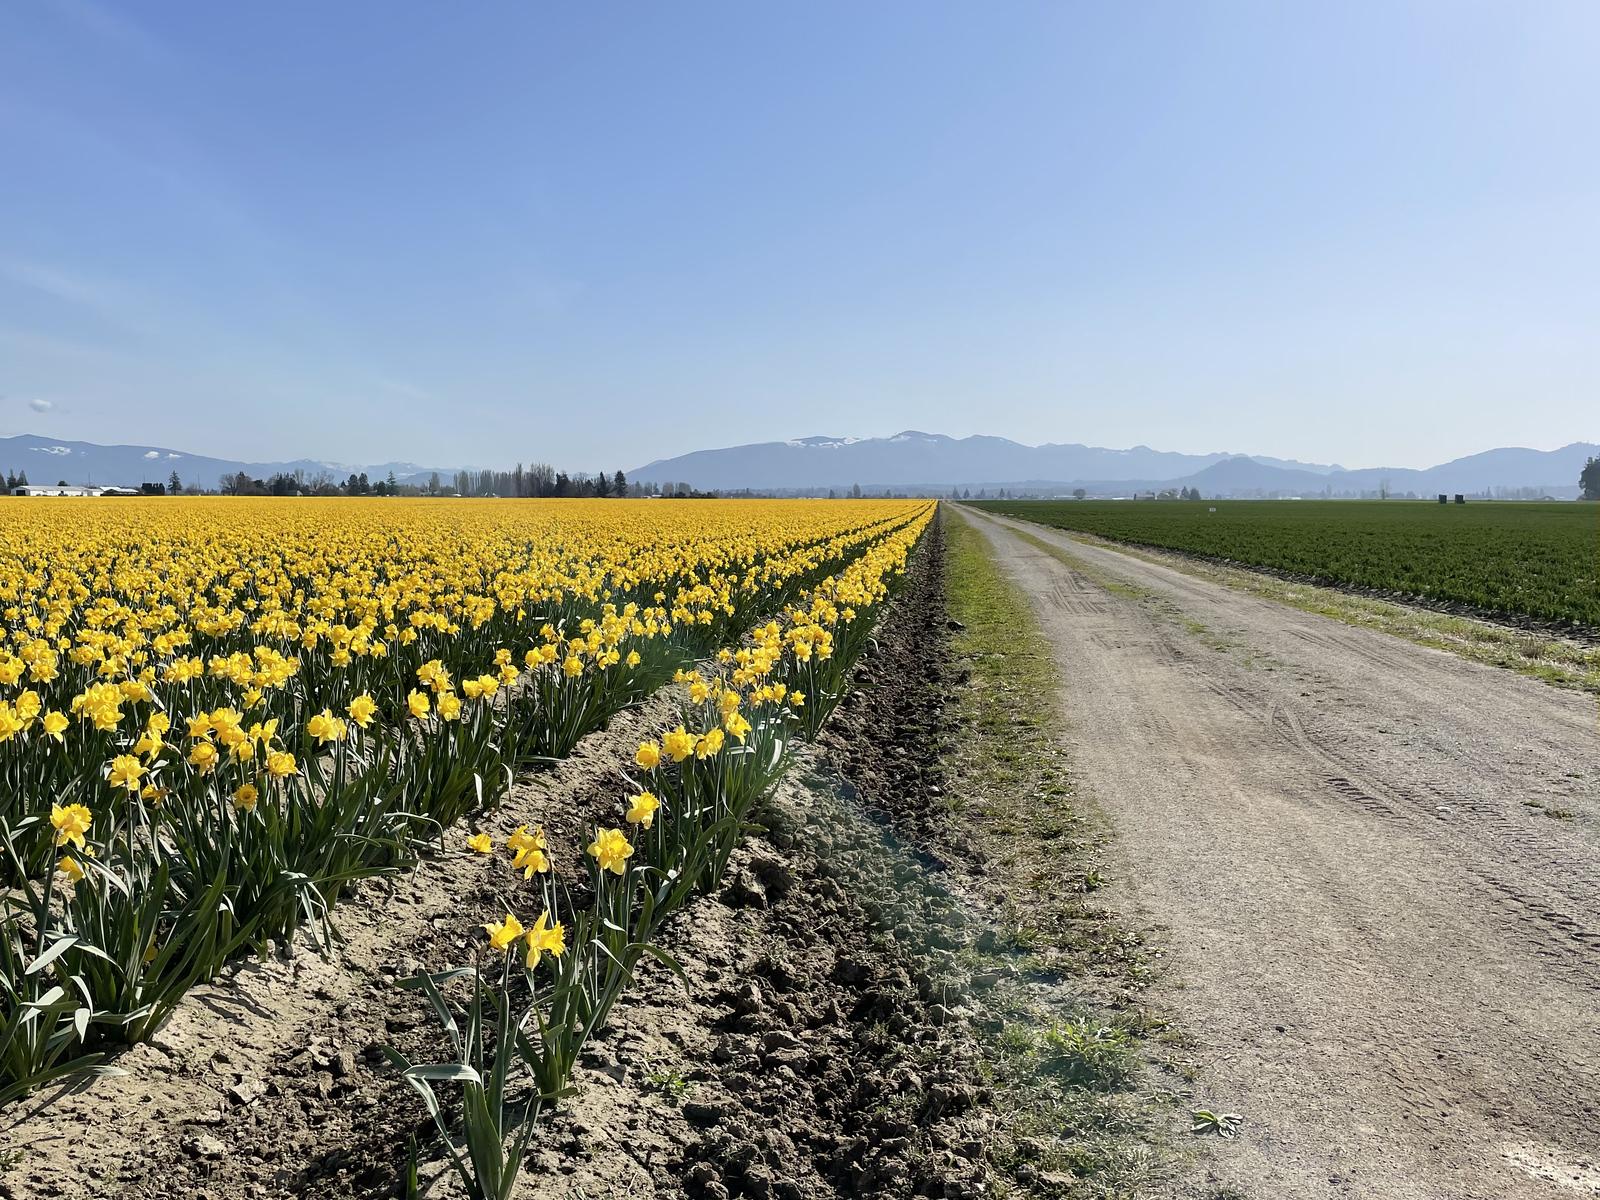 Fields of daffodils